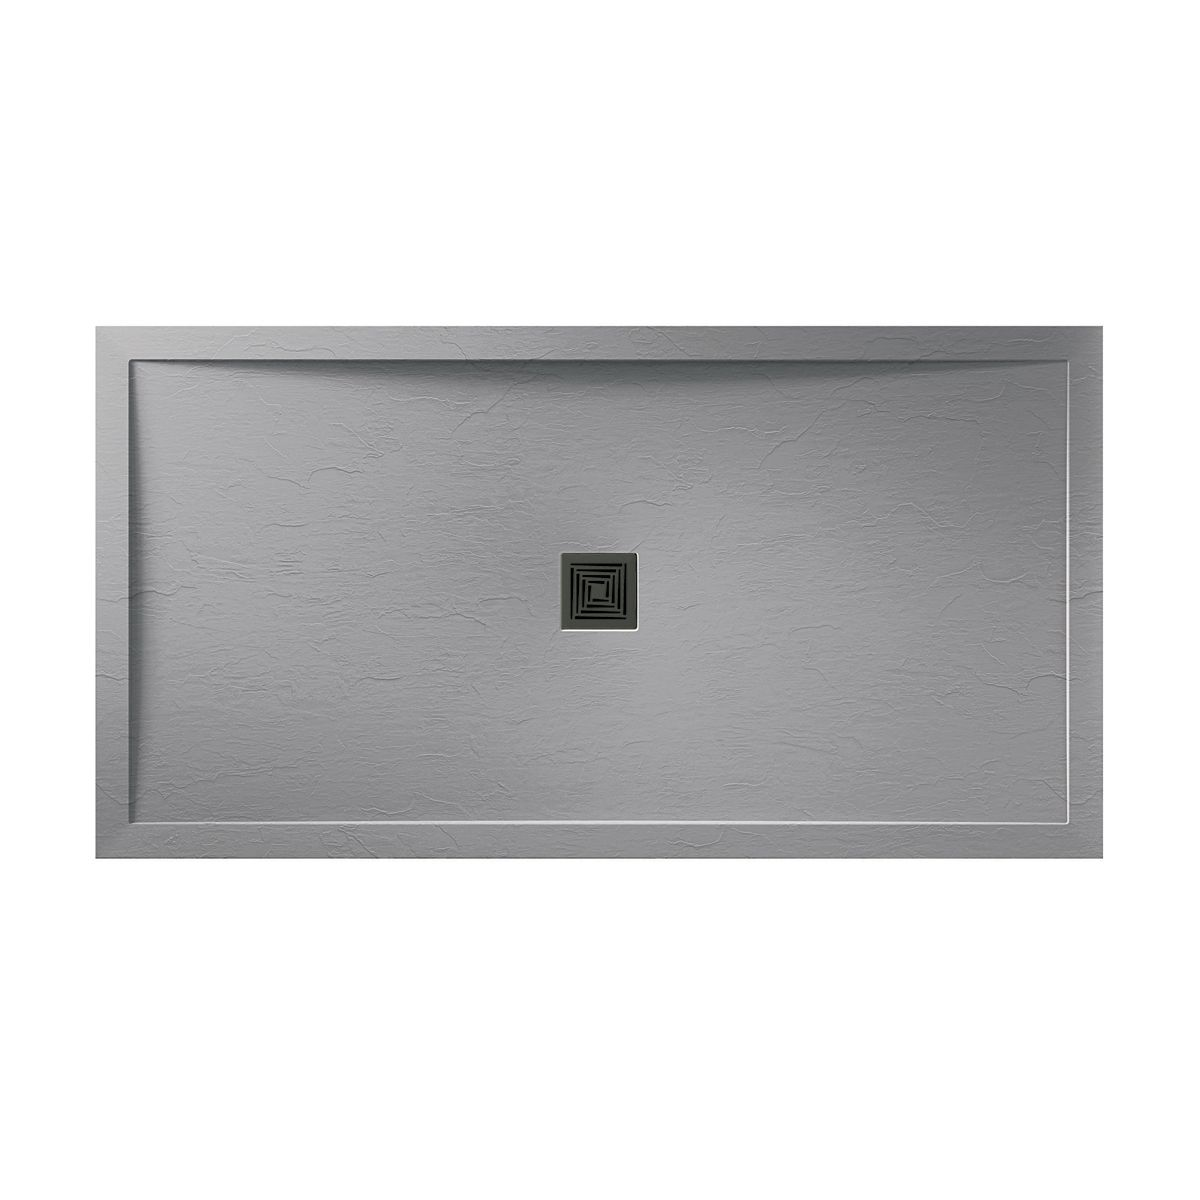 Aquadart Grey Slate Shower Tray 1400 x 700